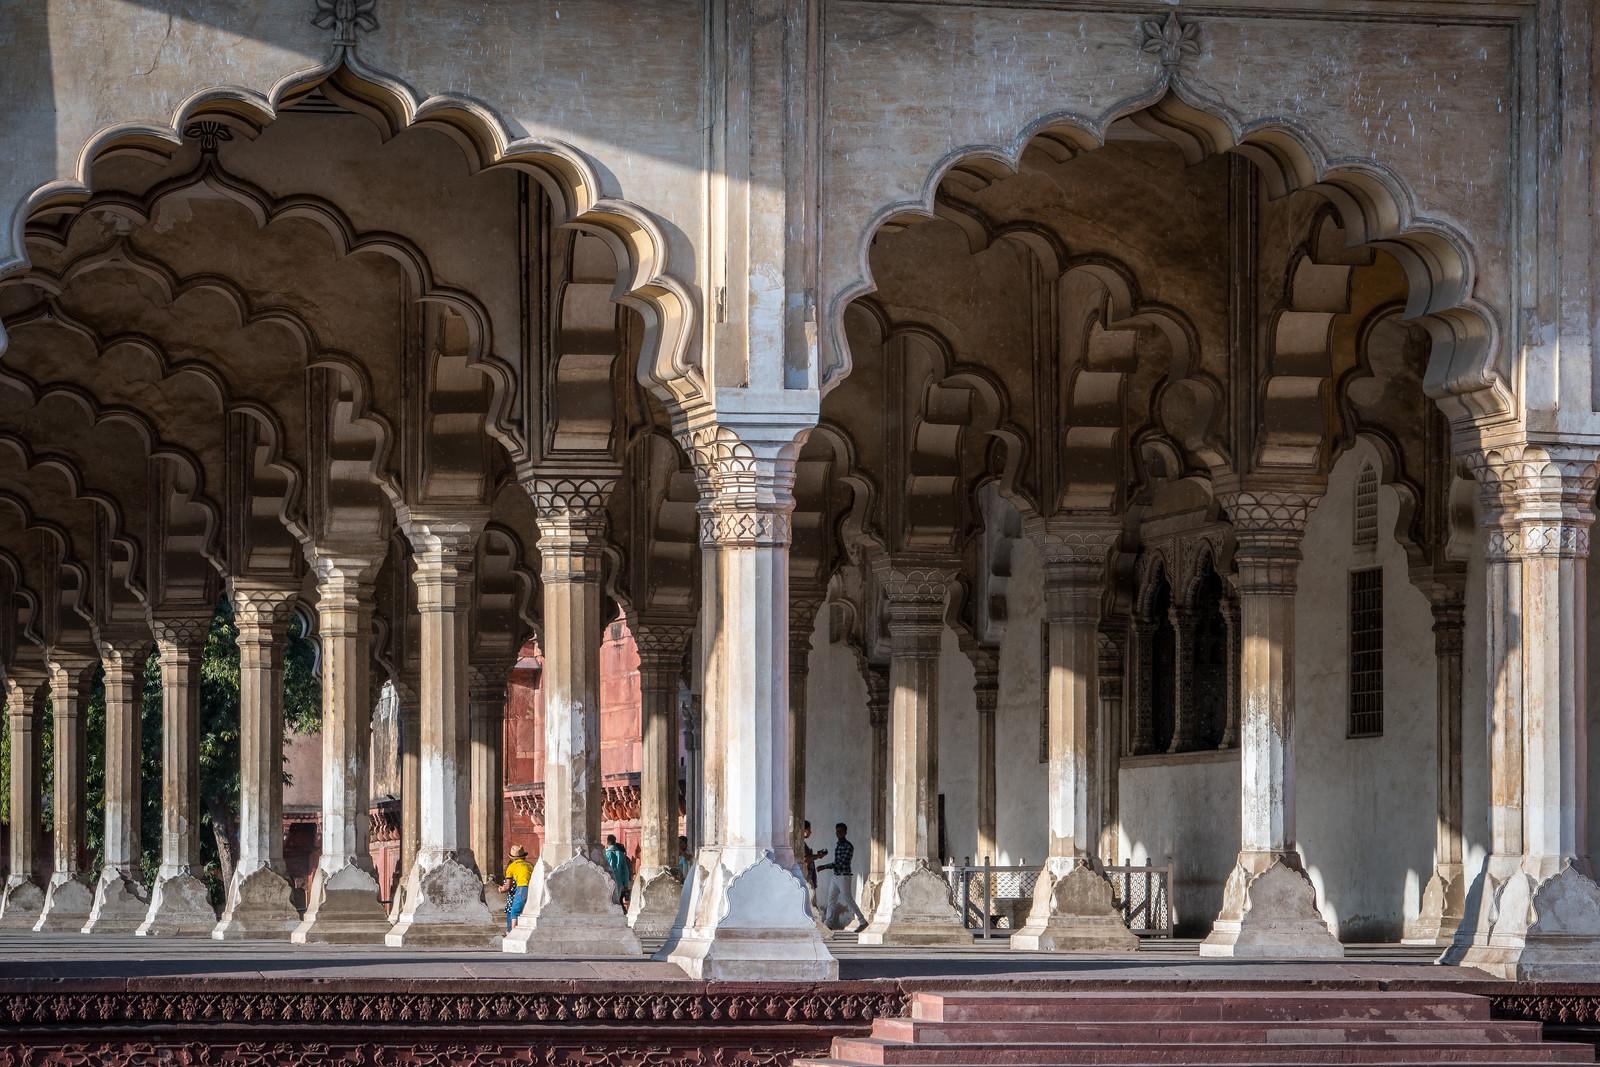 Agra Fort UNESCO World Heritage Site, India